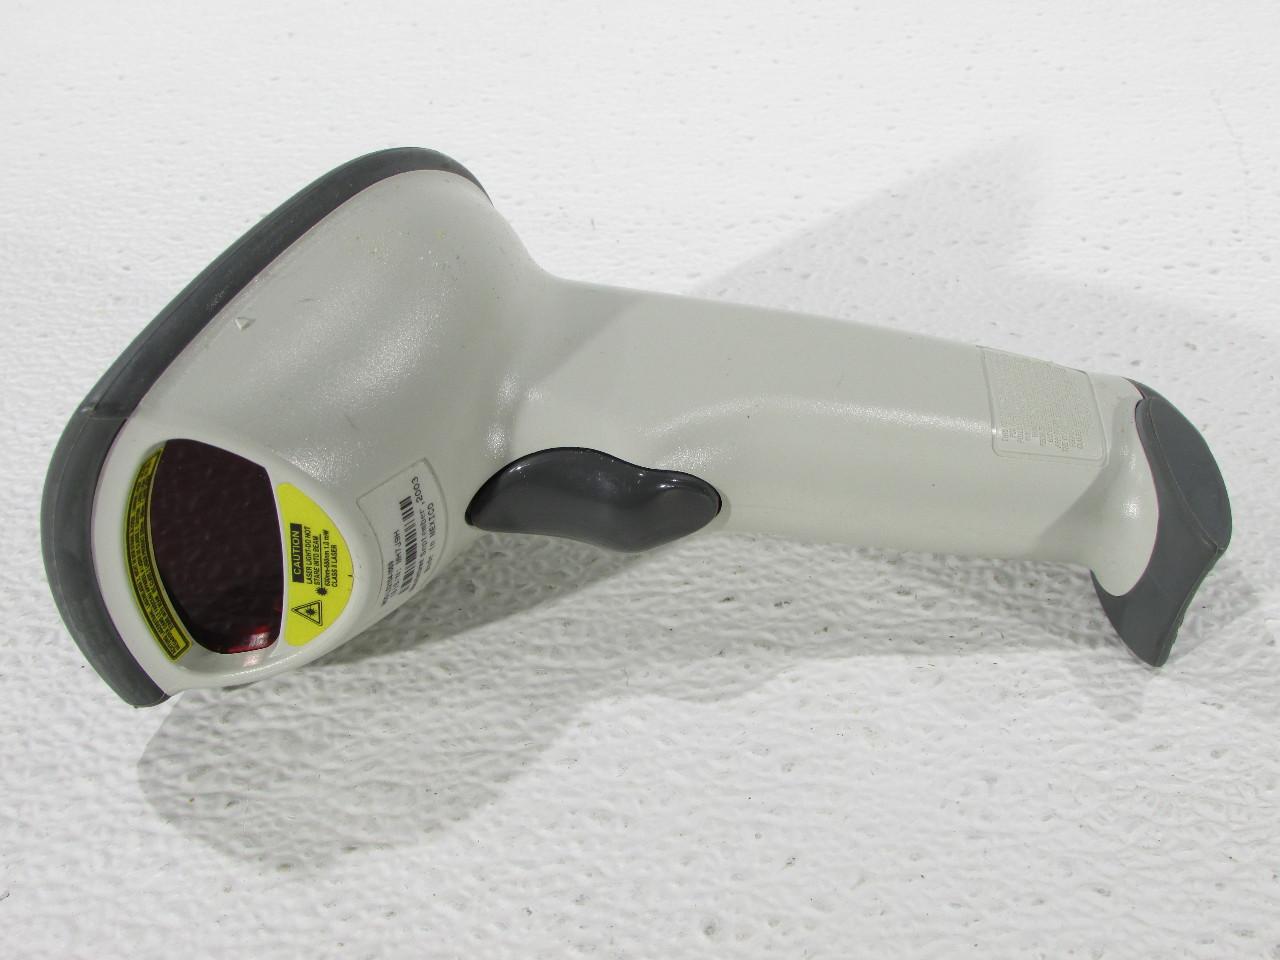 Symbol Ls2104 1009 Hotshot Laser Scanner Ebay